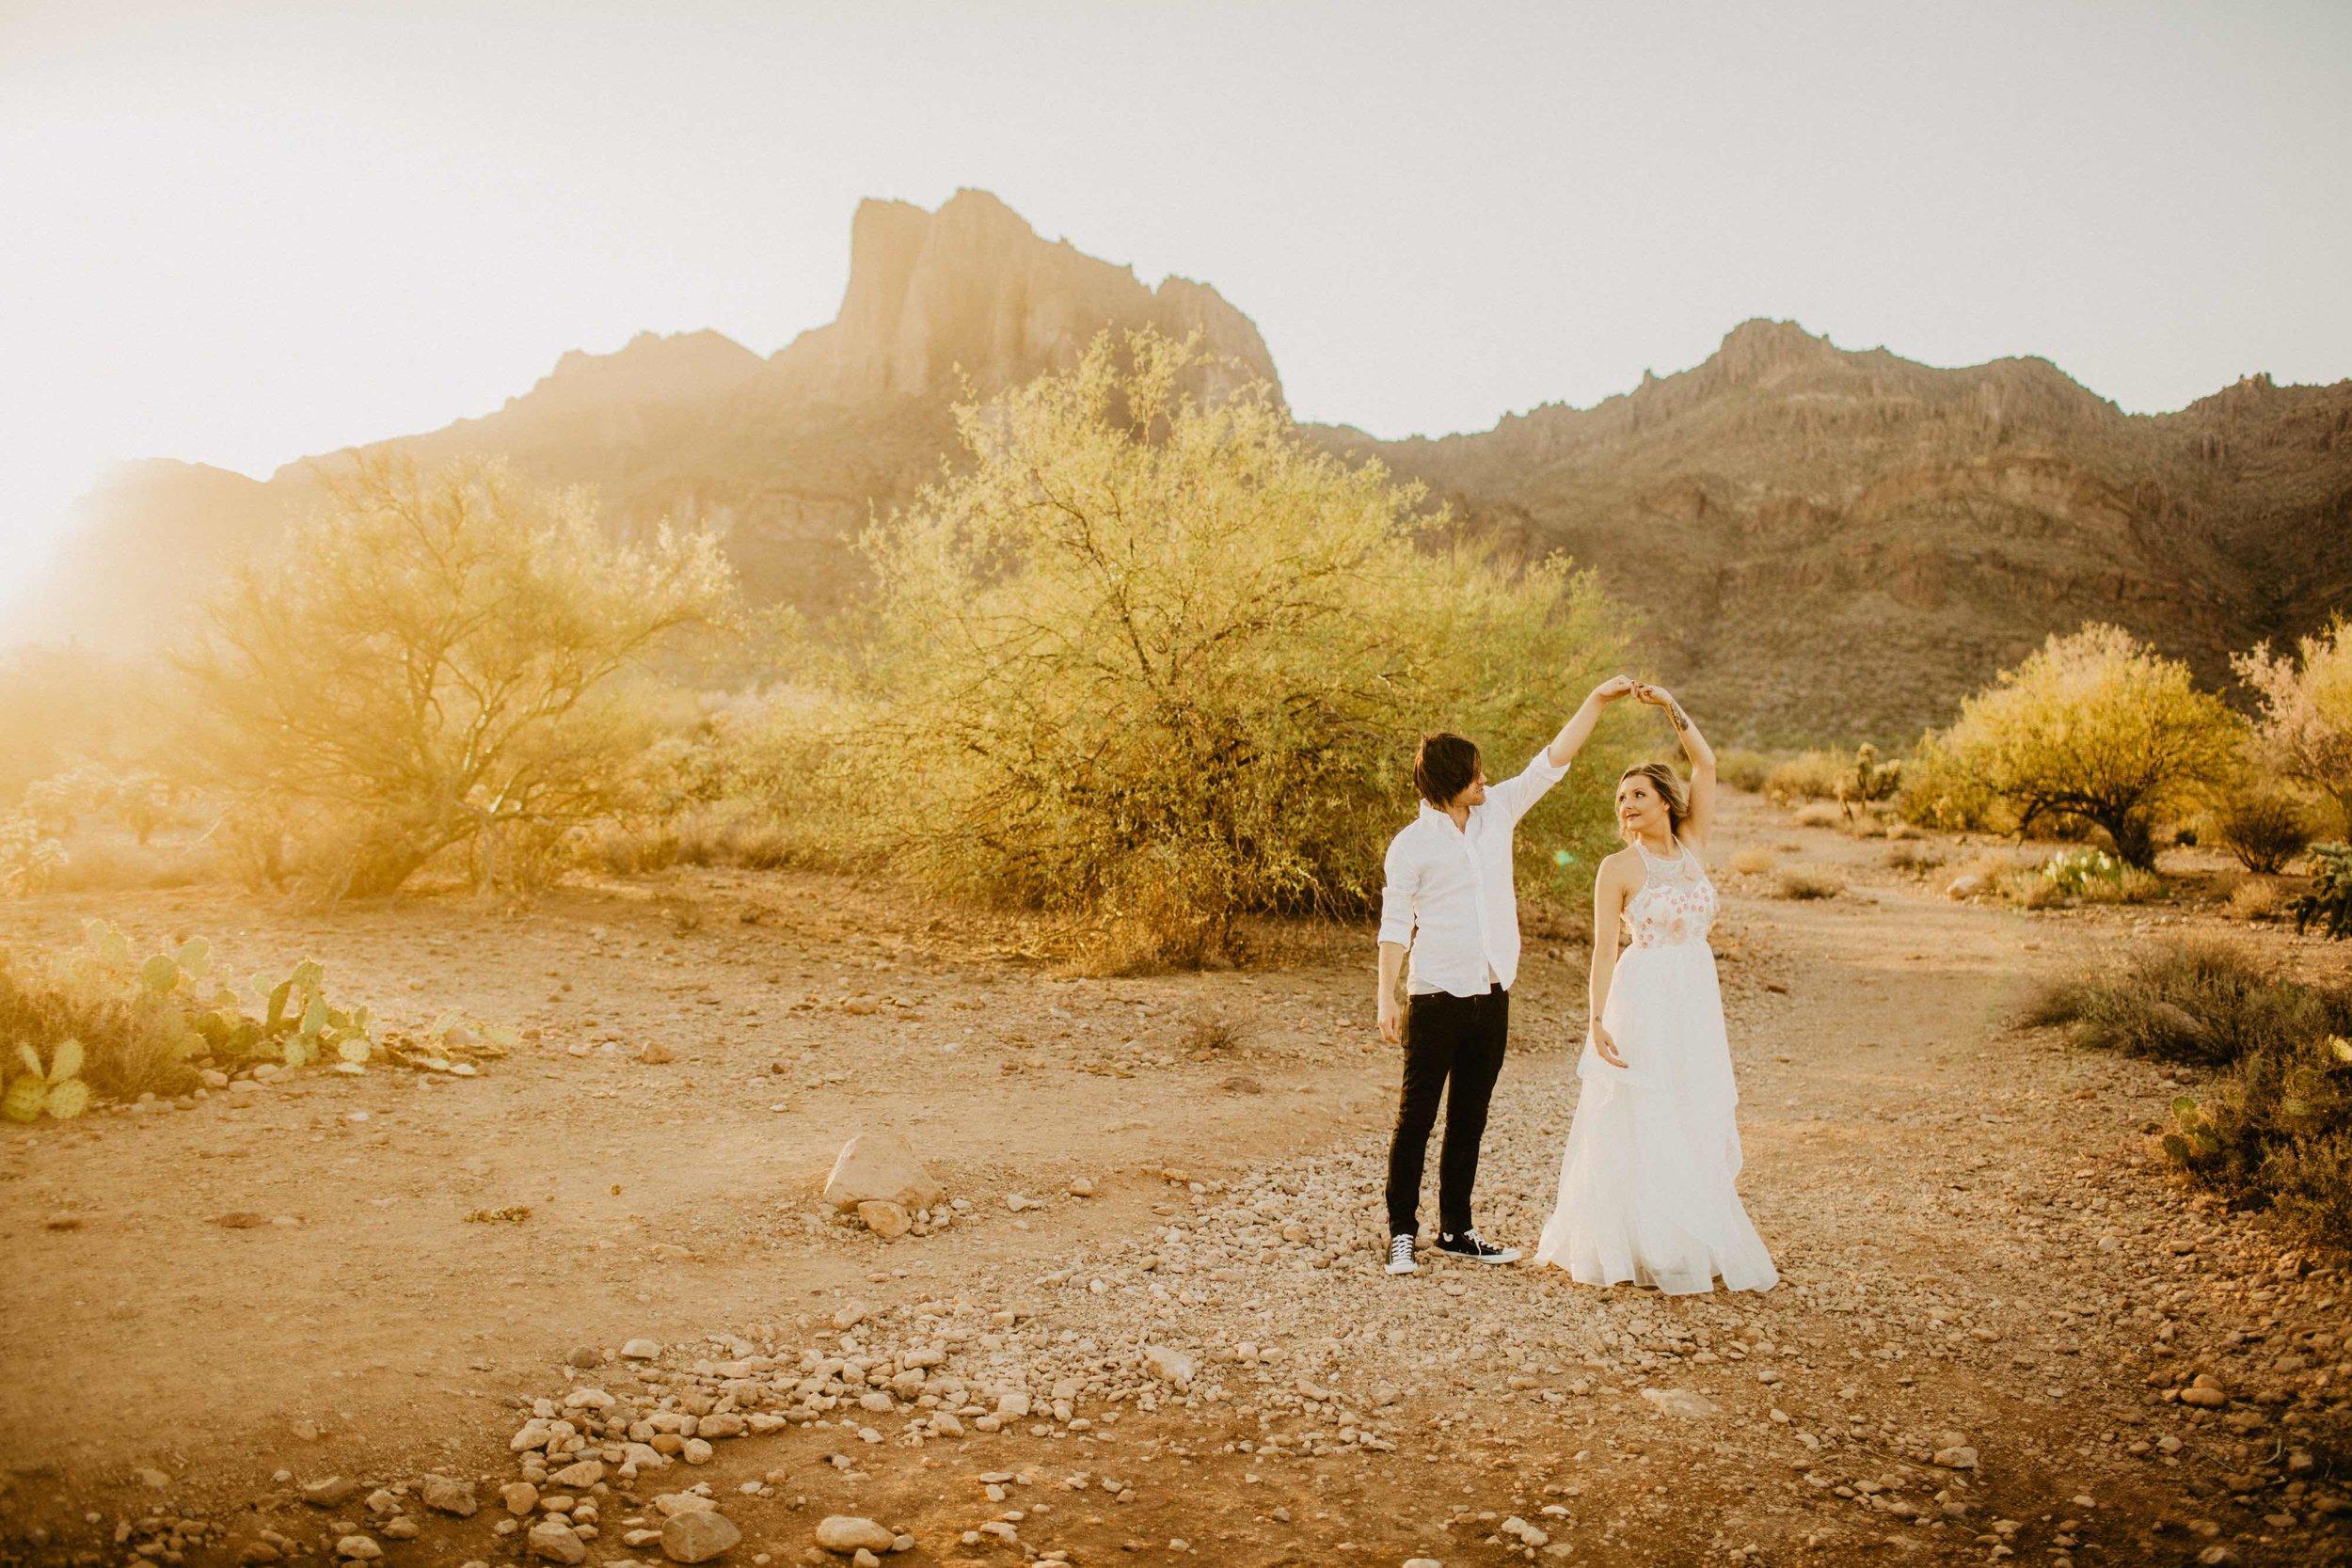 Kisa Conrad Favorites-0008-colorado-wedding-photographer-denver-springs-vail-.jpeg